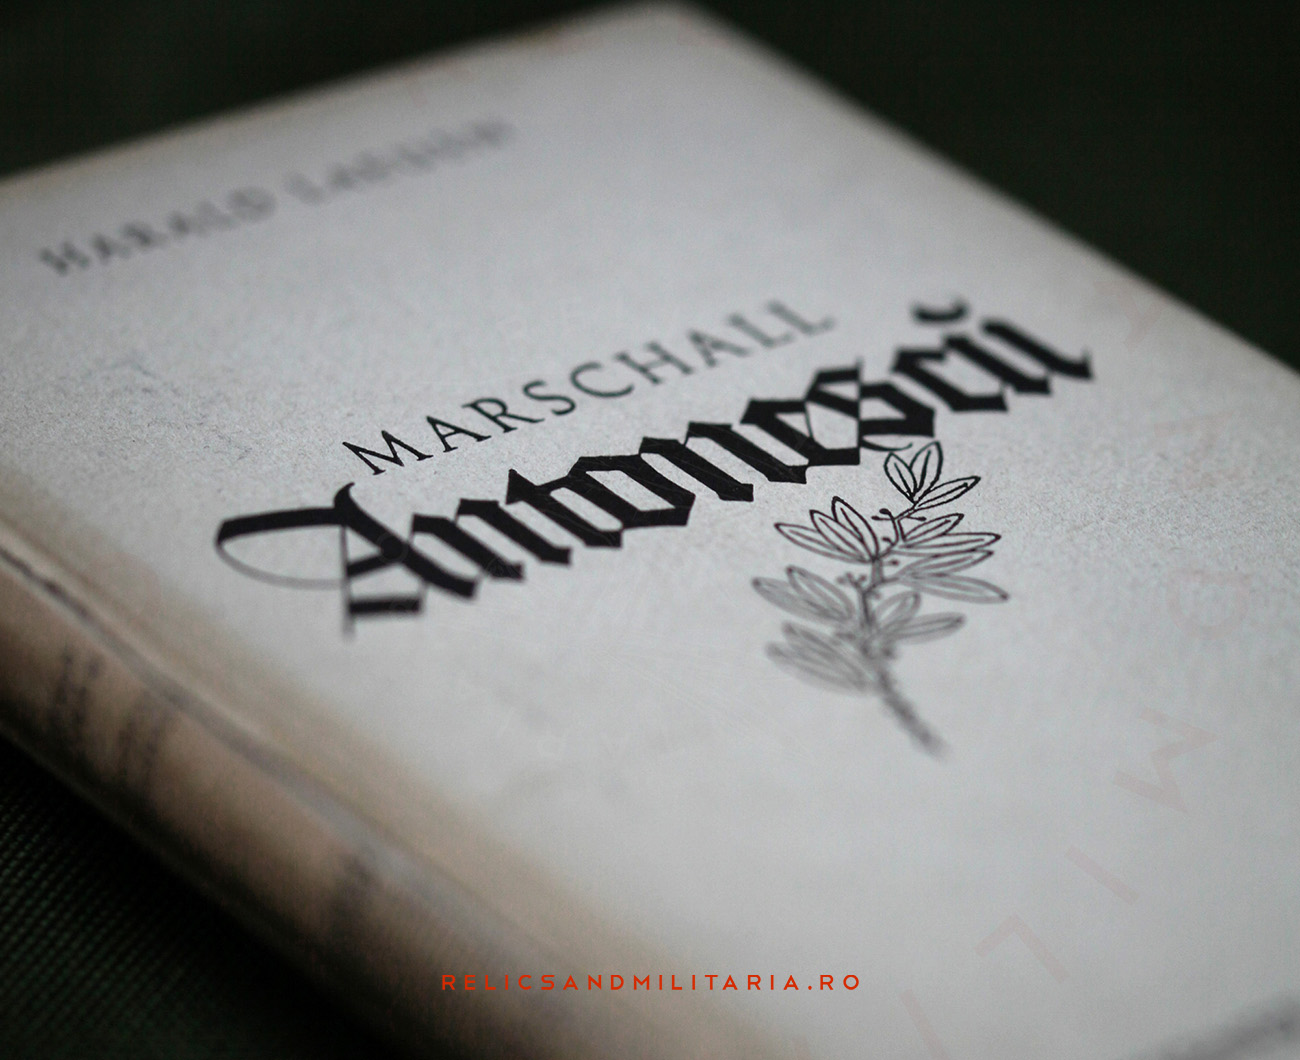 Marschall Ion Antonescu - Harald Laeuen book